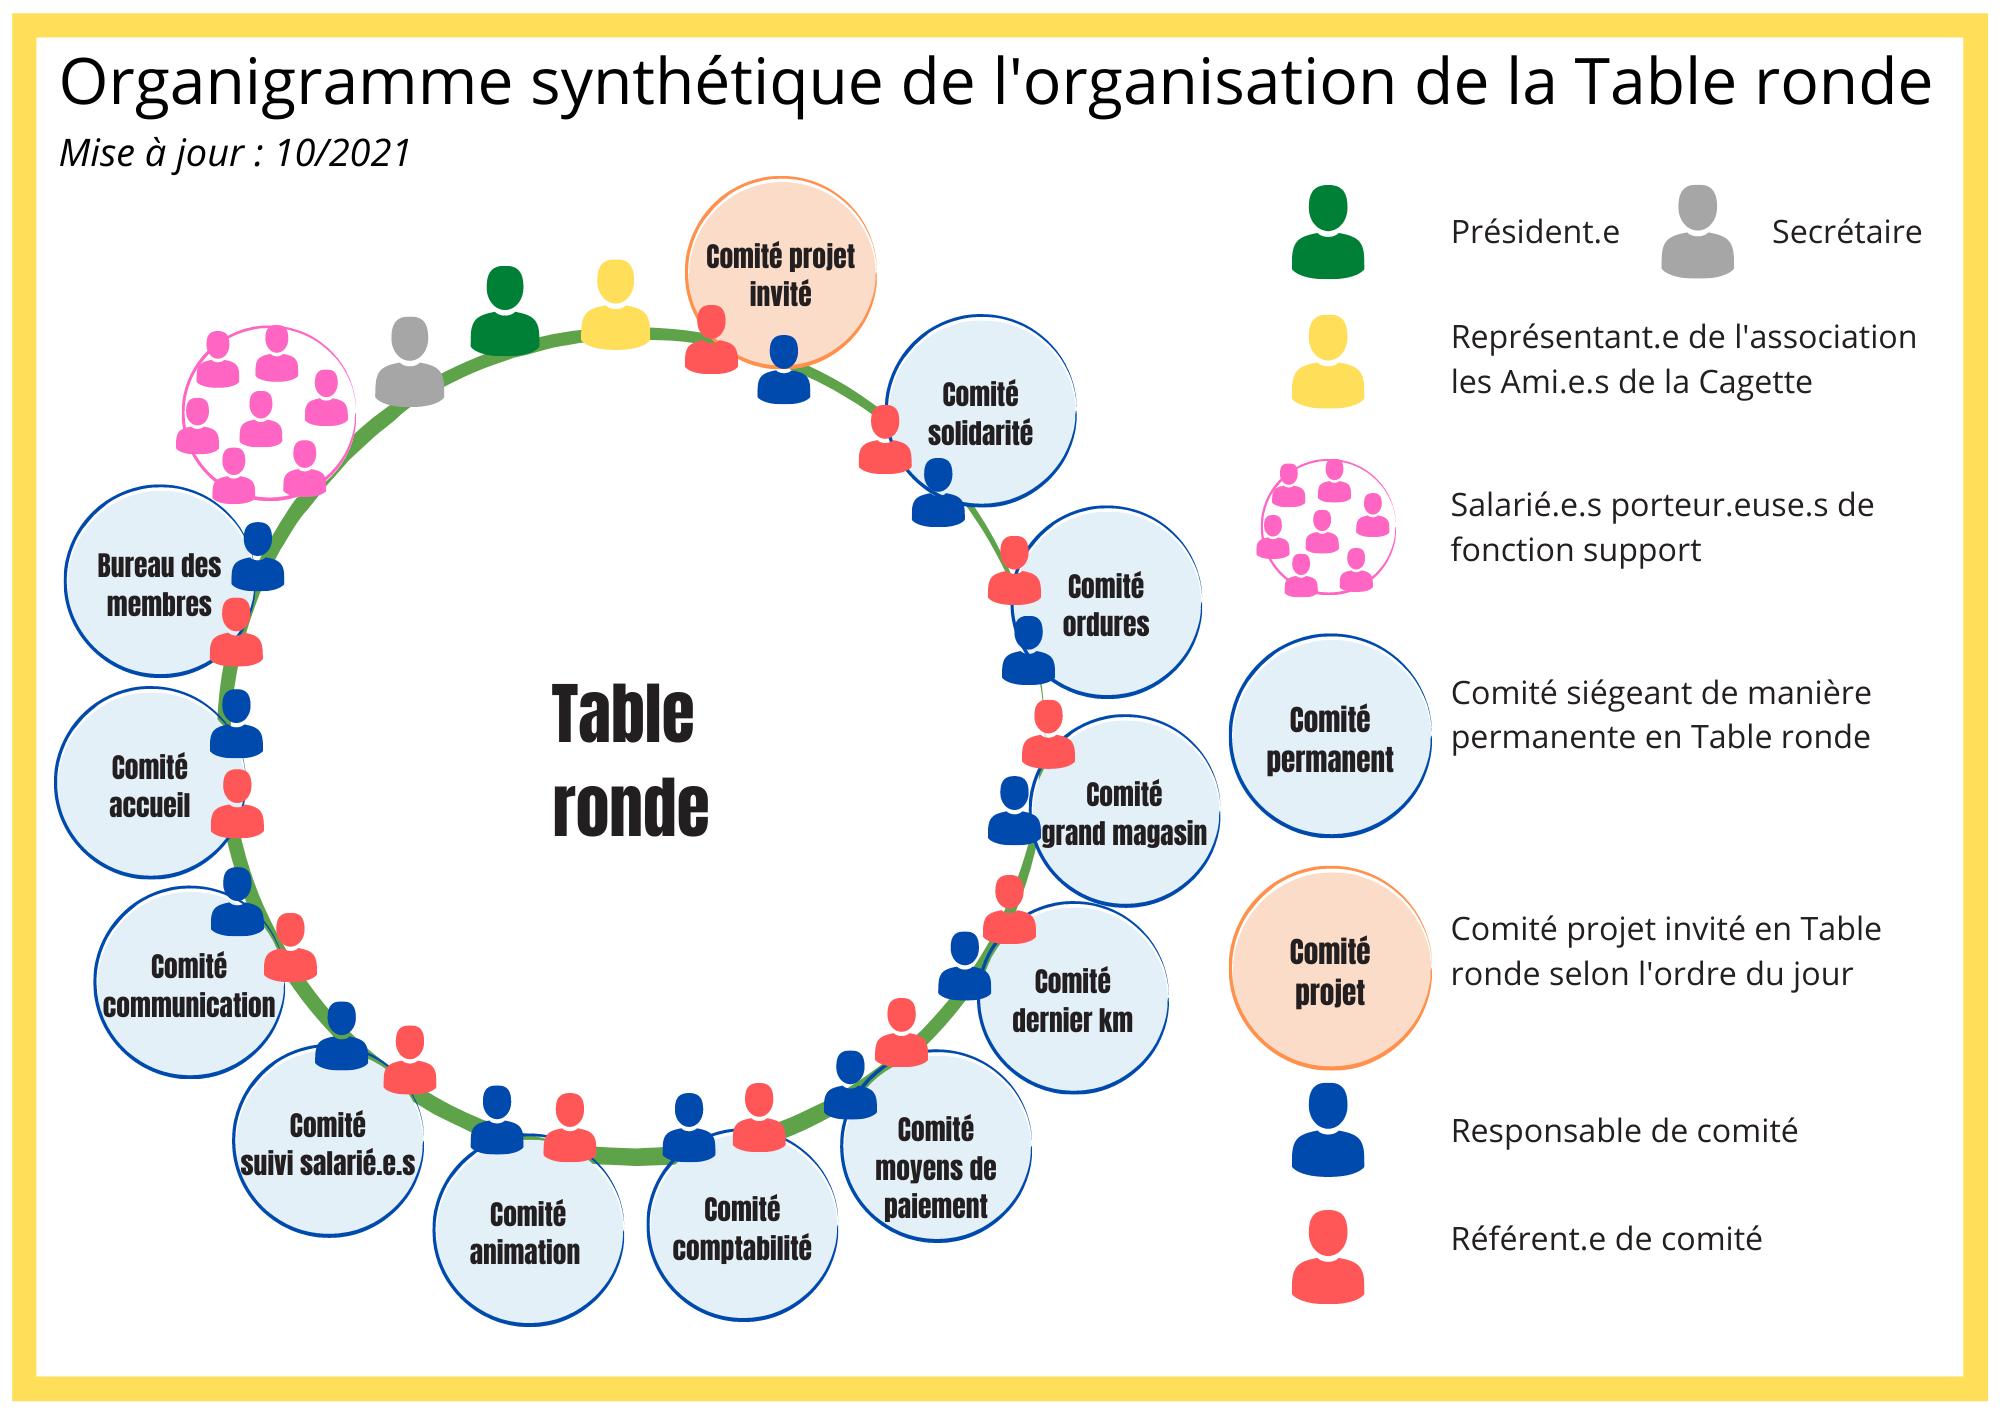 image Organigramme_synthtique_de_la_Table_ronde.png (0.4MB)